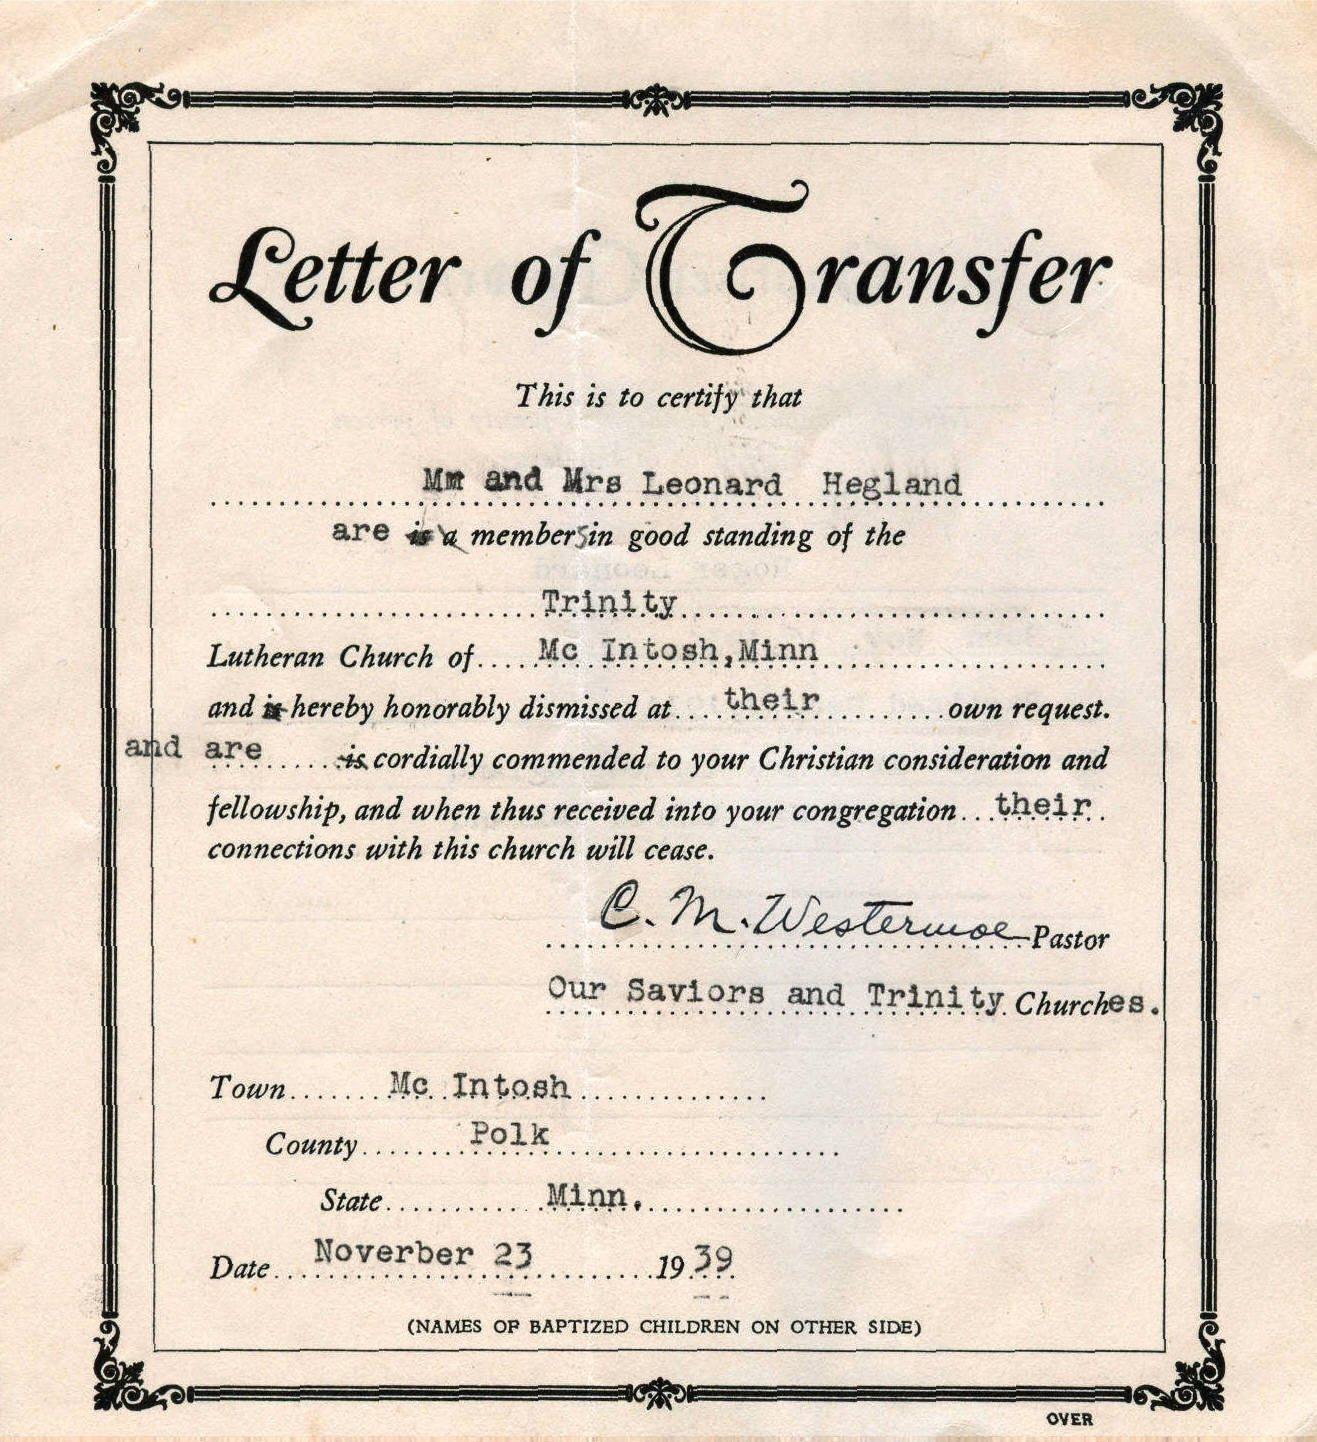 Church Membership Transfer Letter Tracking Leonard and Myrtle S Church Membership